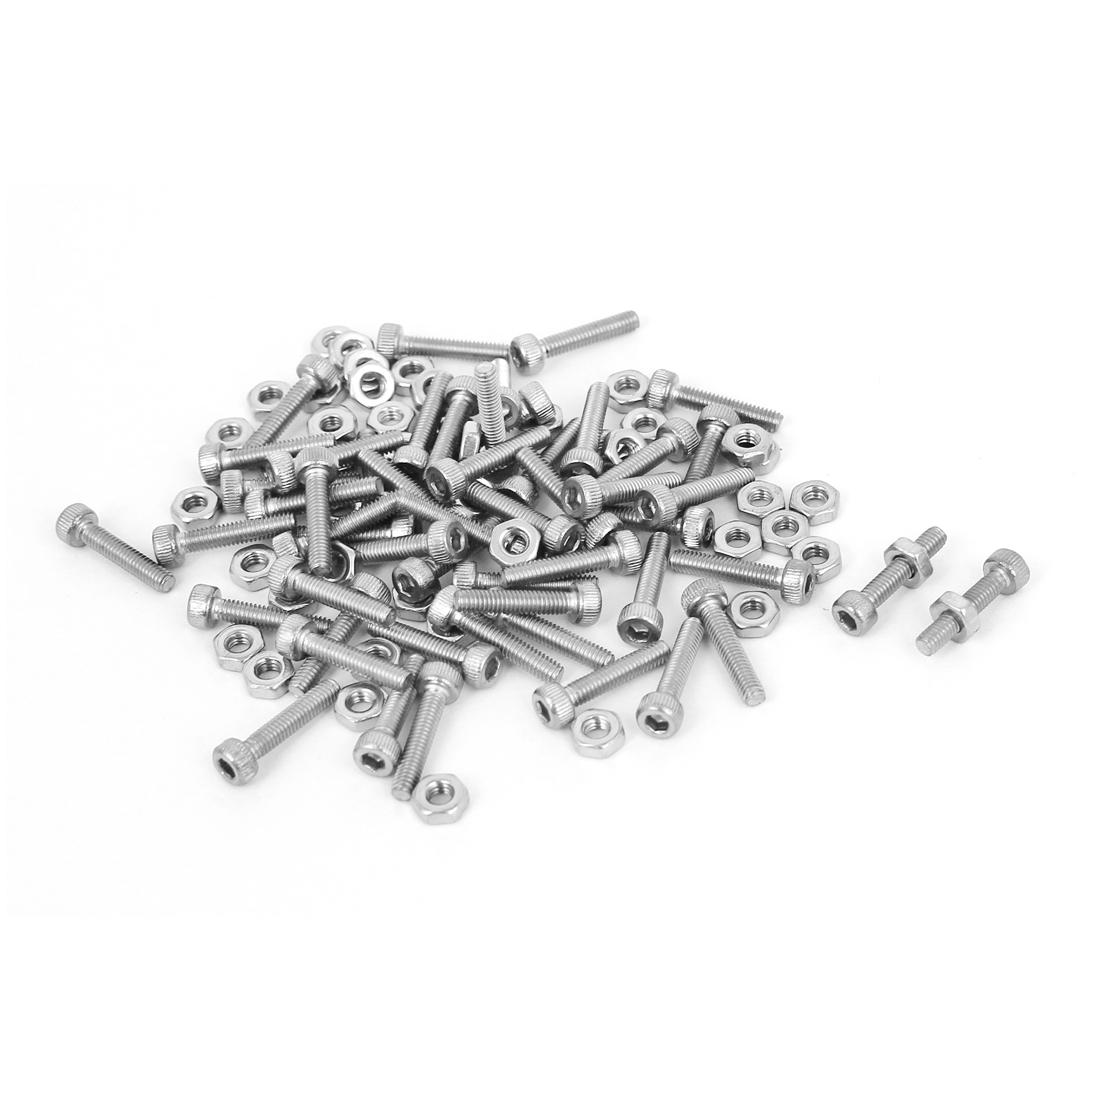 M2.5x12mm Stainless Steel Hex Socket Head Knurled Cap Screws Bolts Nut Set 50Pcs